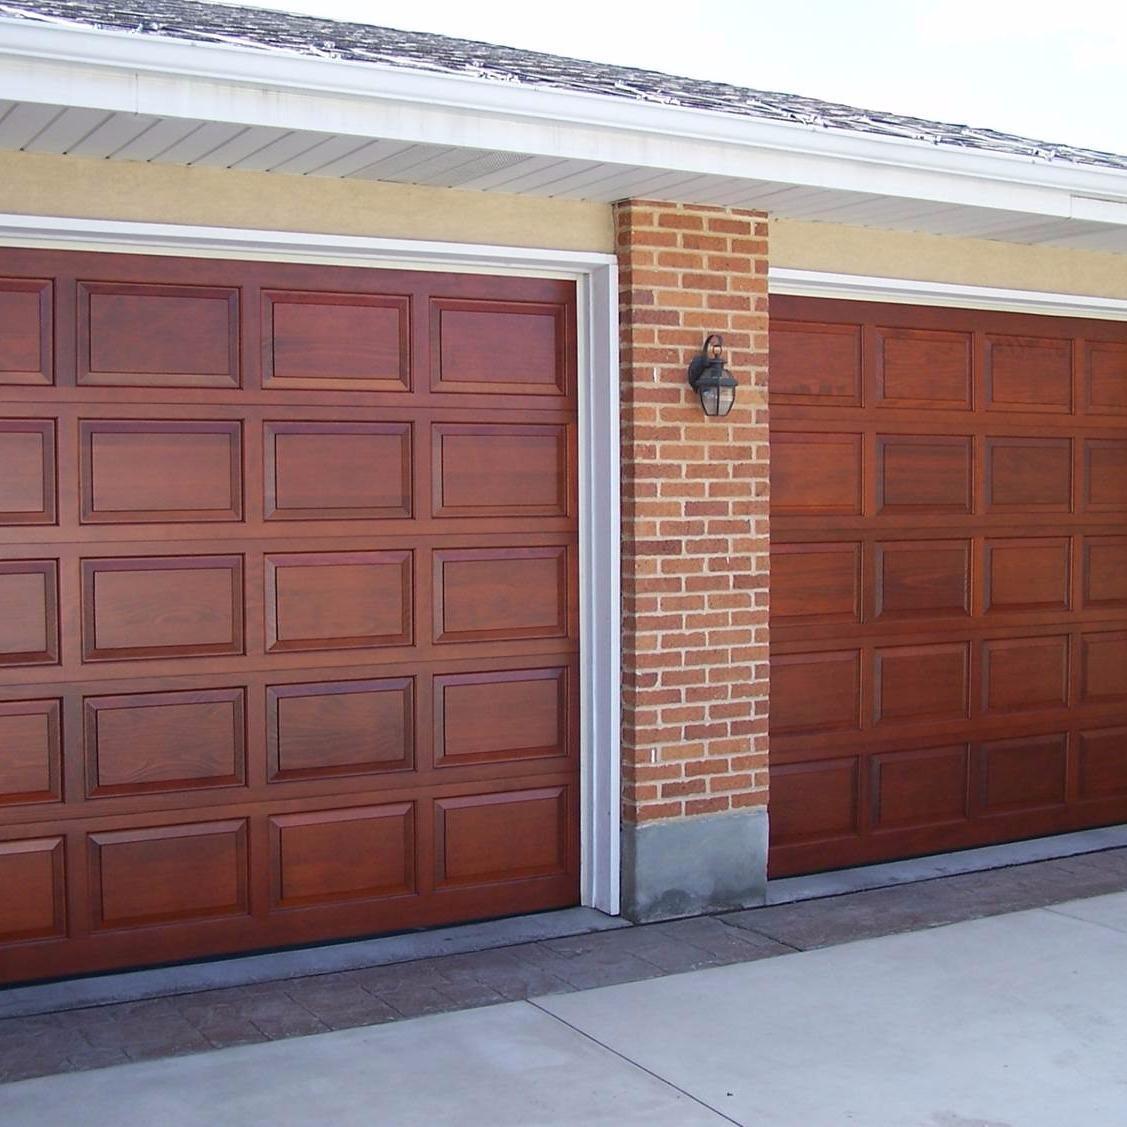 Hage stoneware long beach california ca for Long beach garage door repair